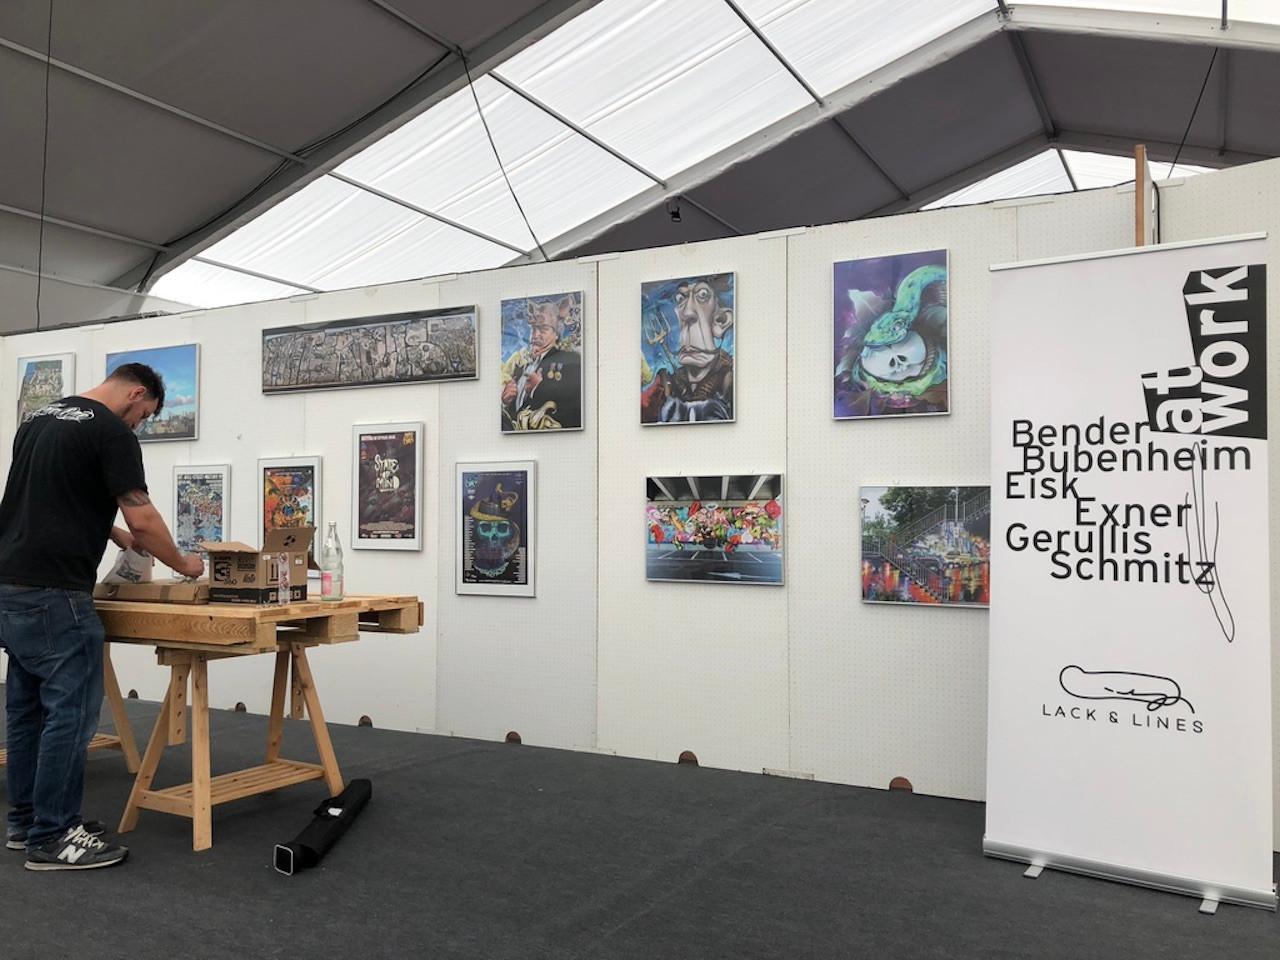 Ausstellung Graffiti im MKK,Messe-Wächtersbach 2018